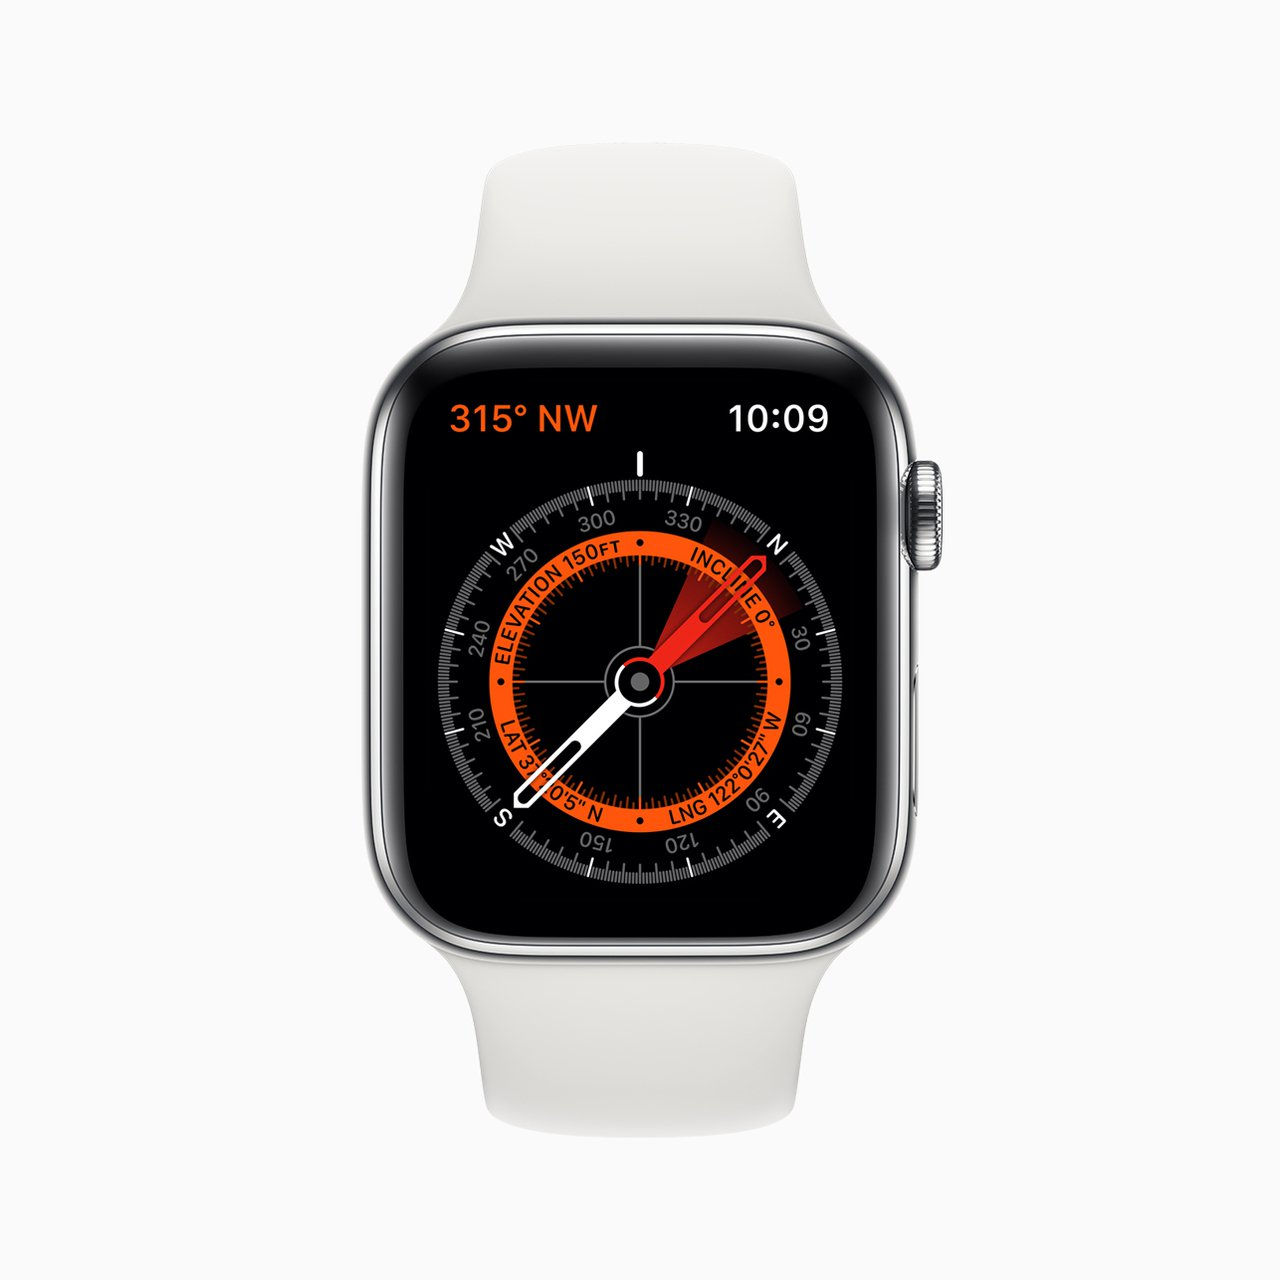 Apple Watch Series 5內建指南針功能。圖/蘋果提供